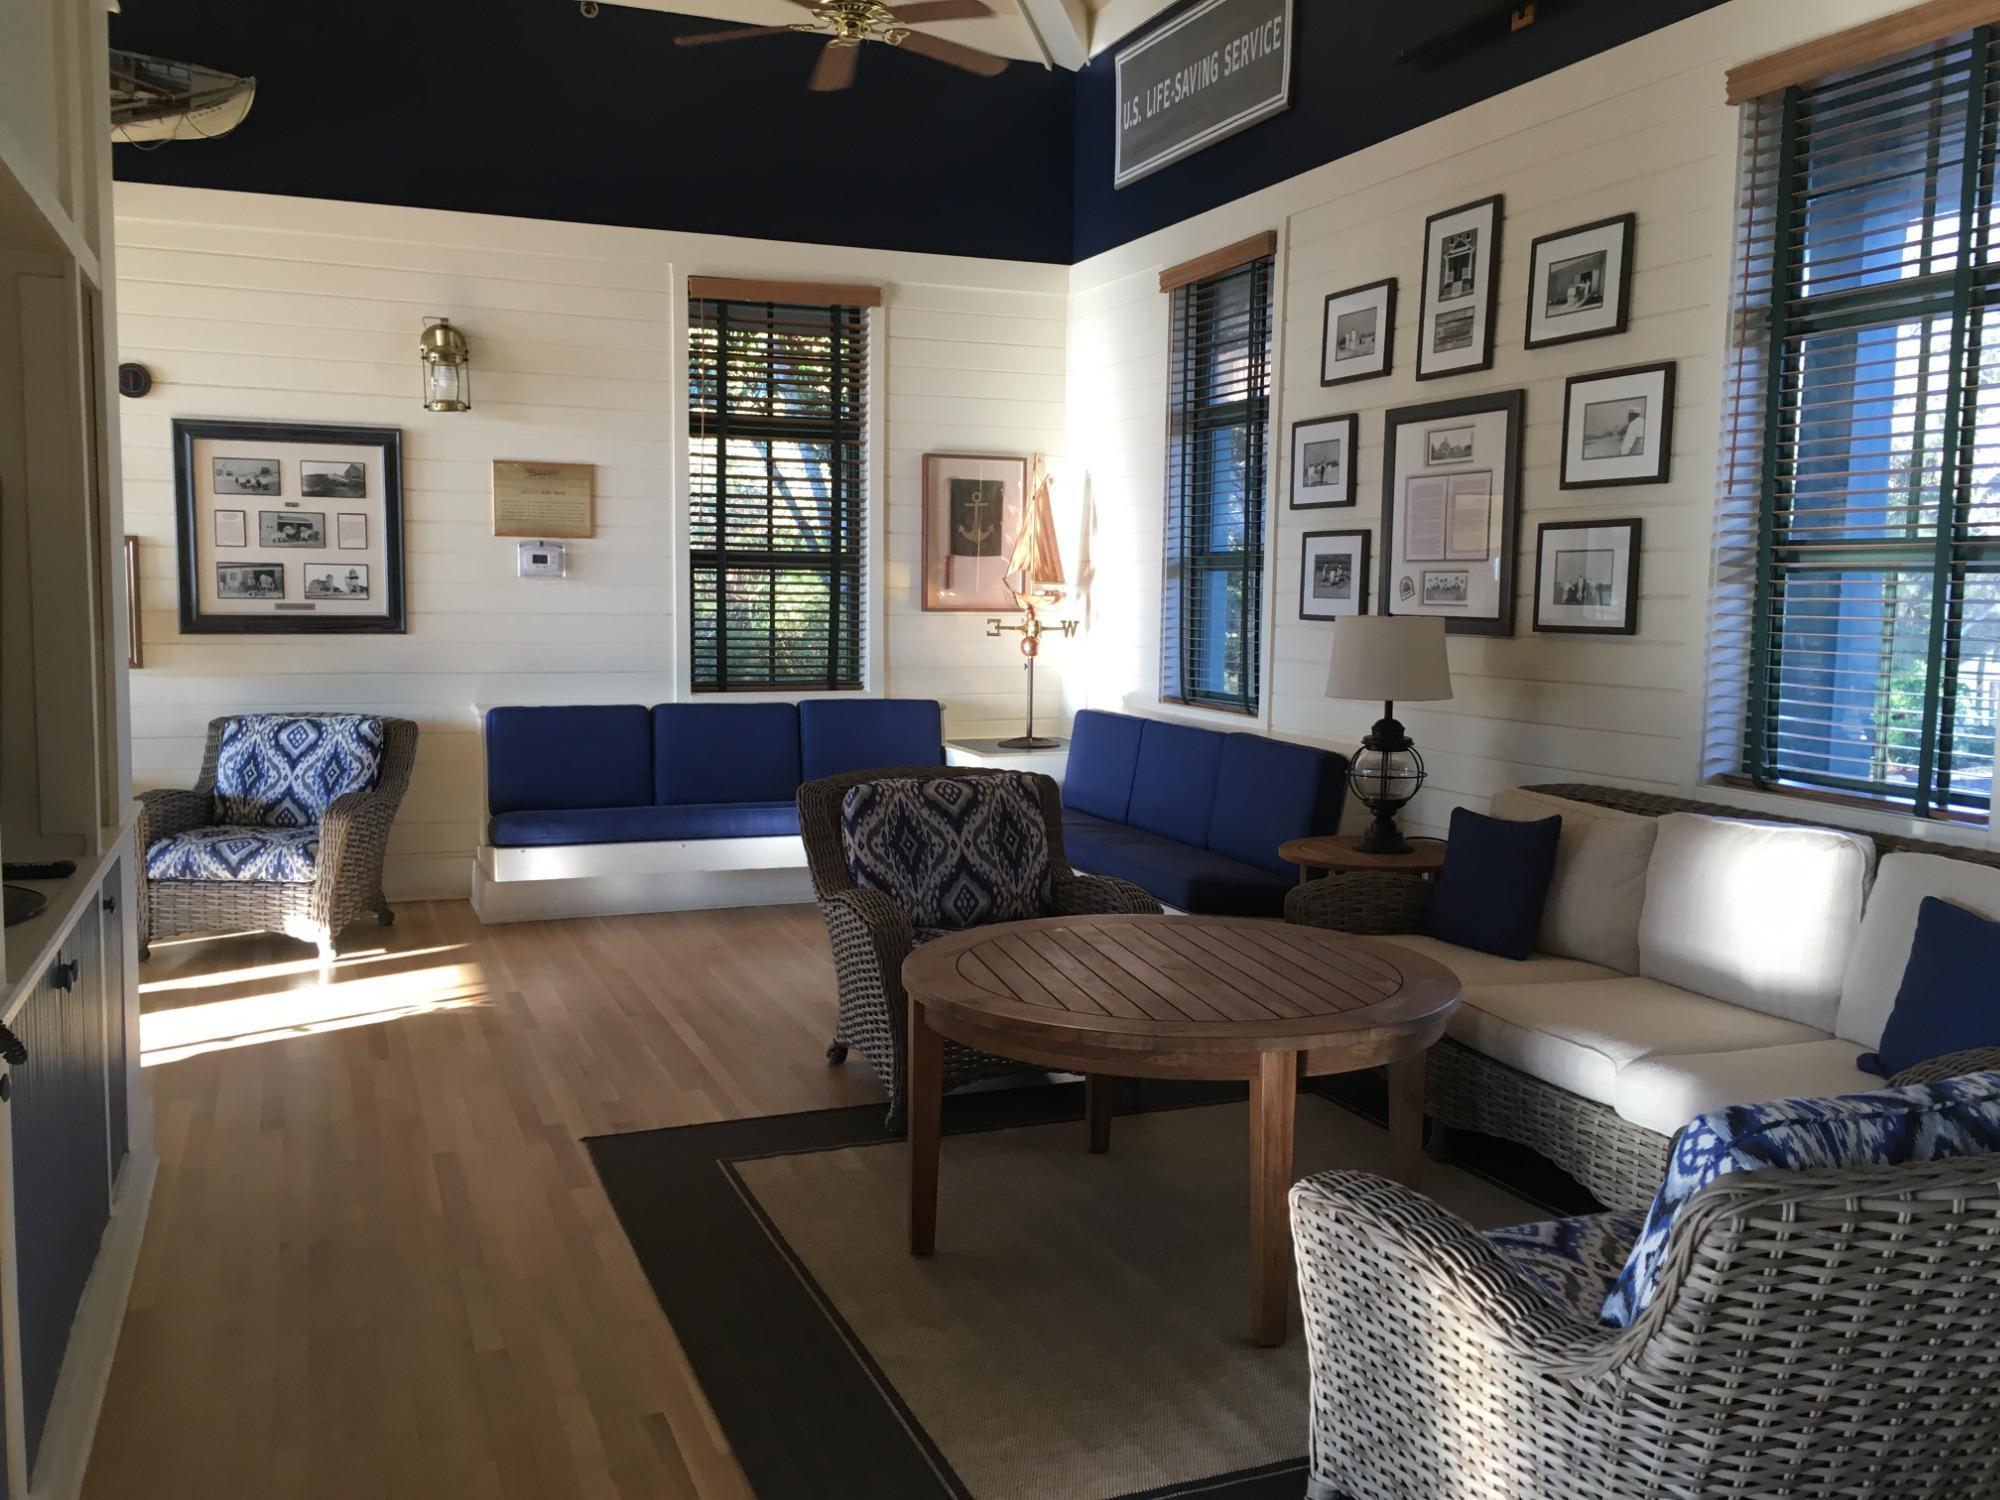 Disney's Hilton Head Island Resort Living Room